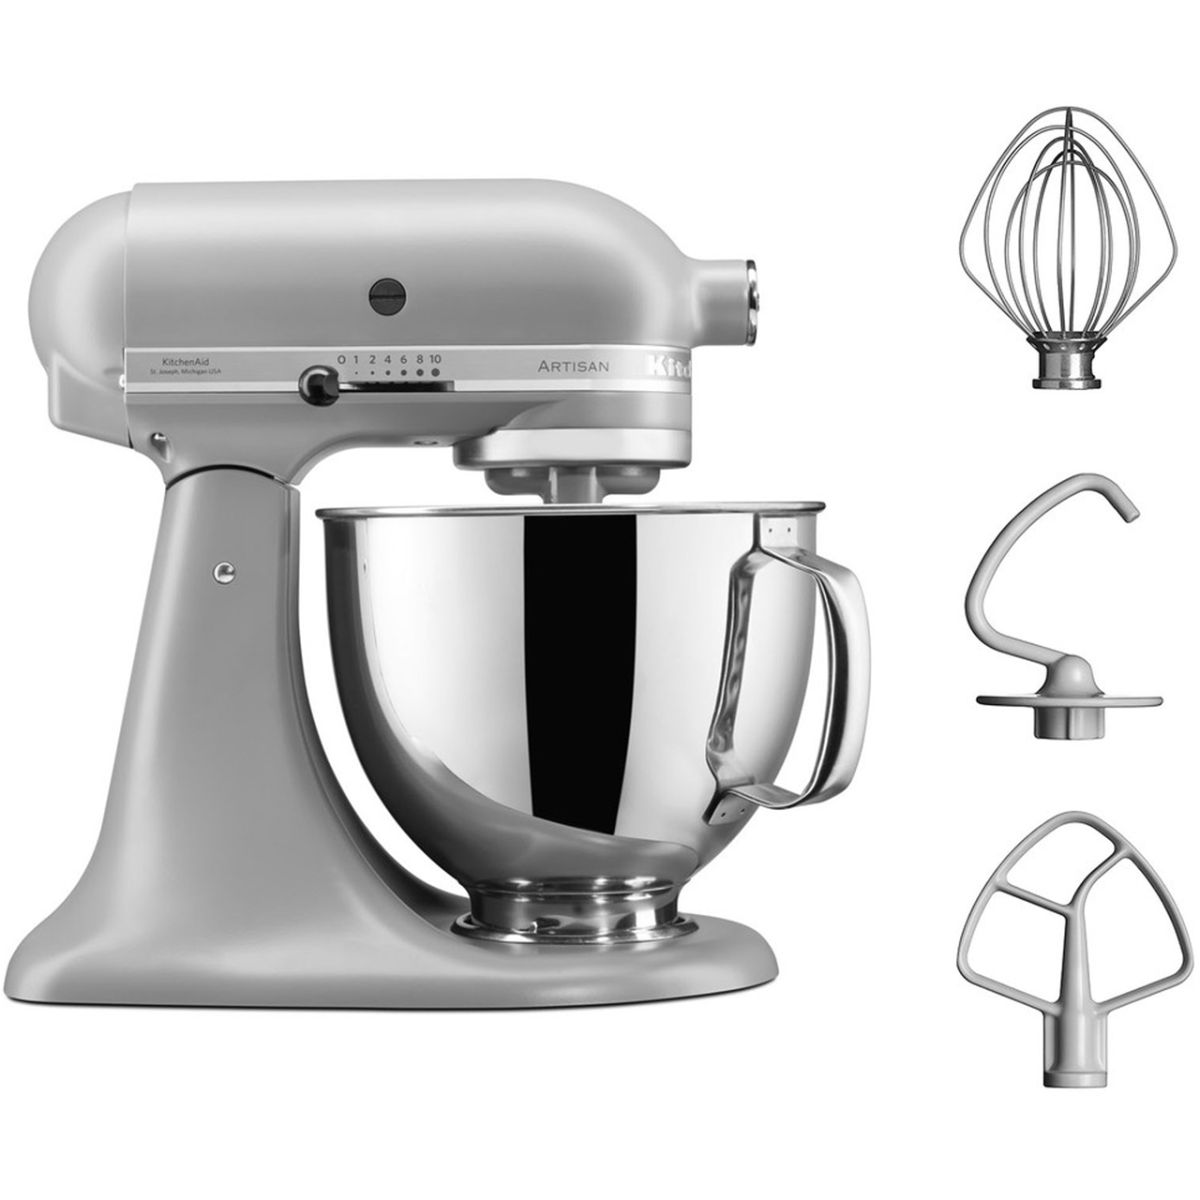 kitchenaid mixer black friday sale 2020